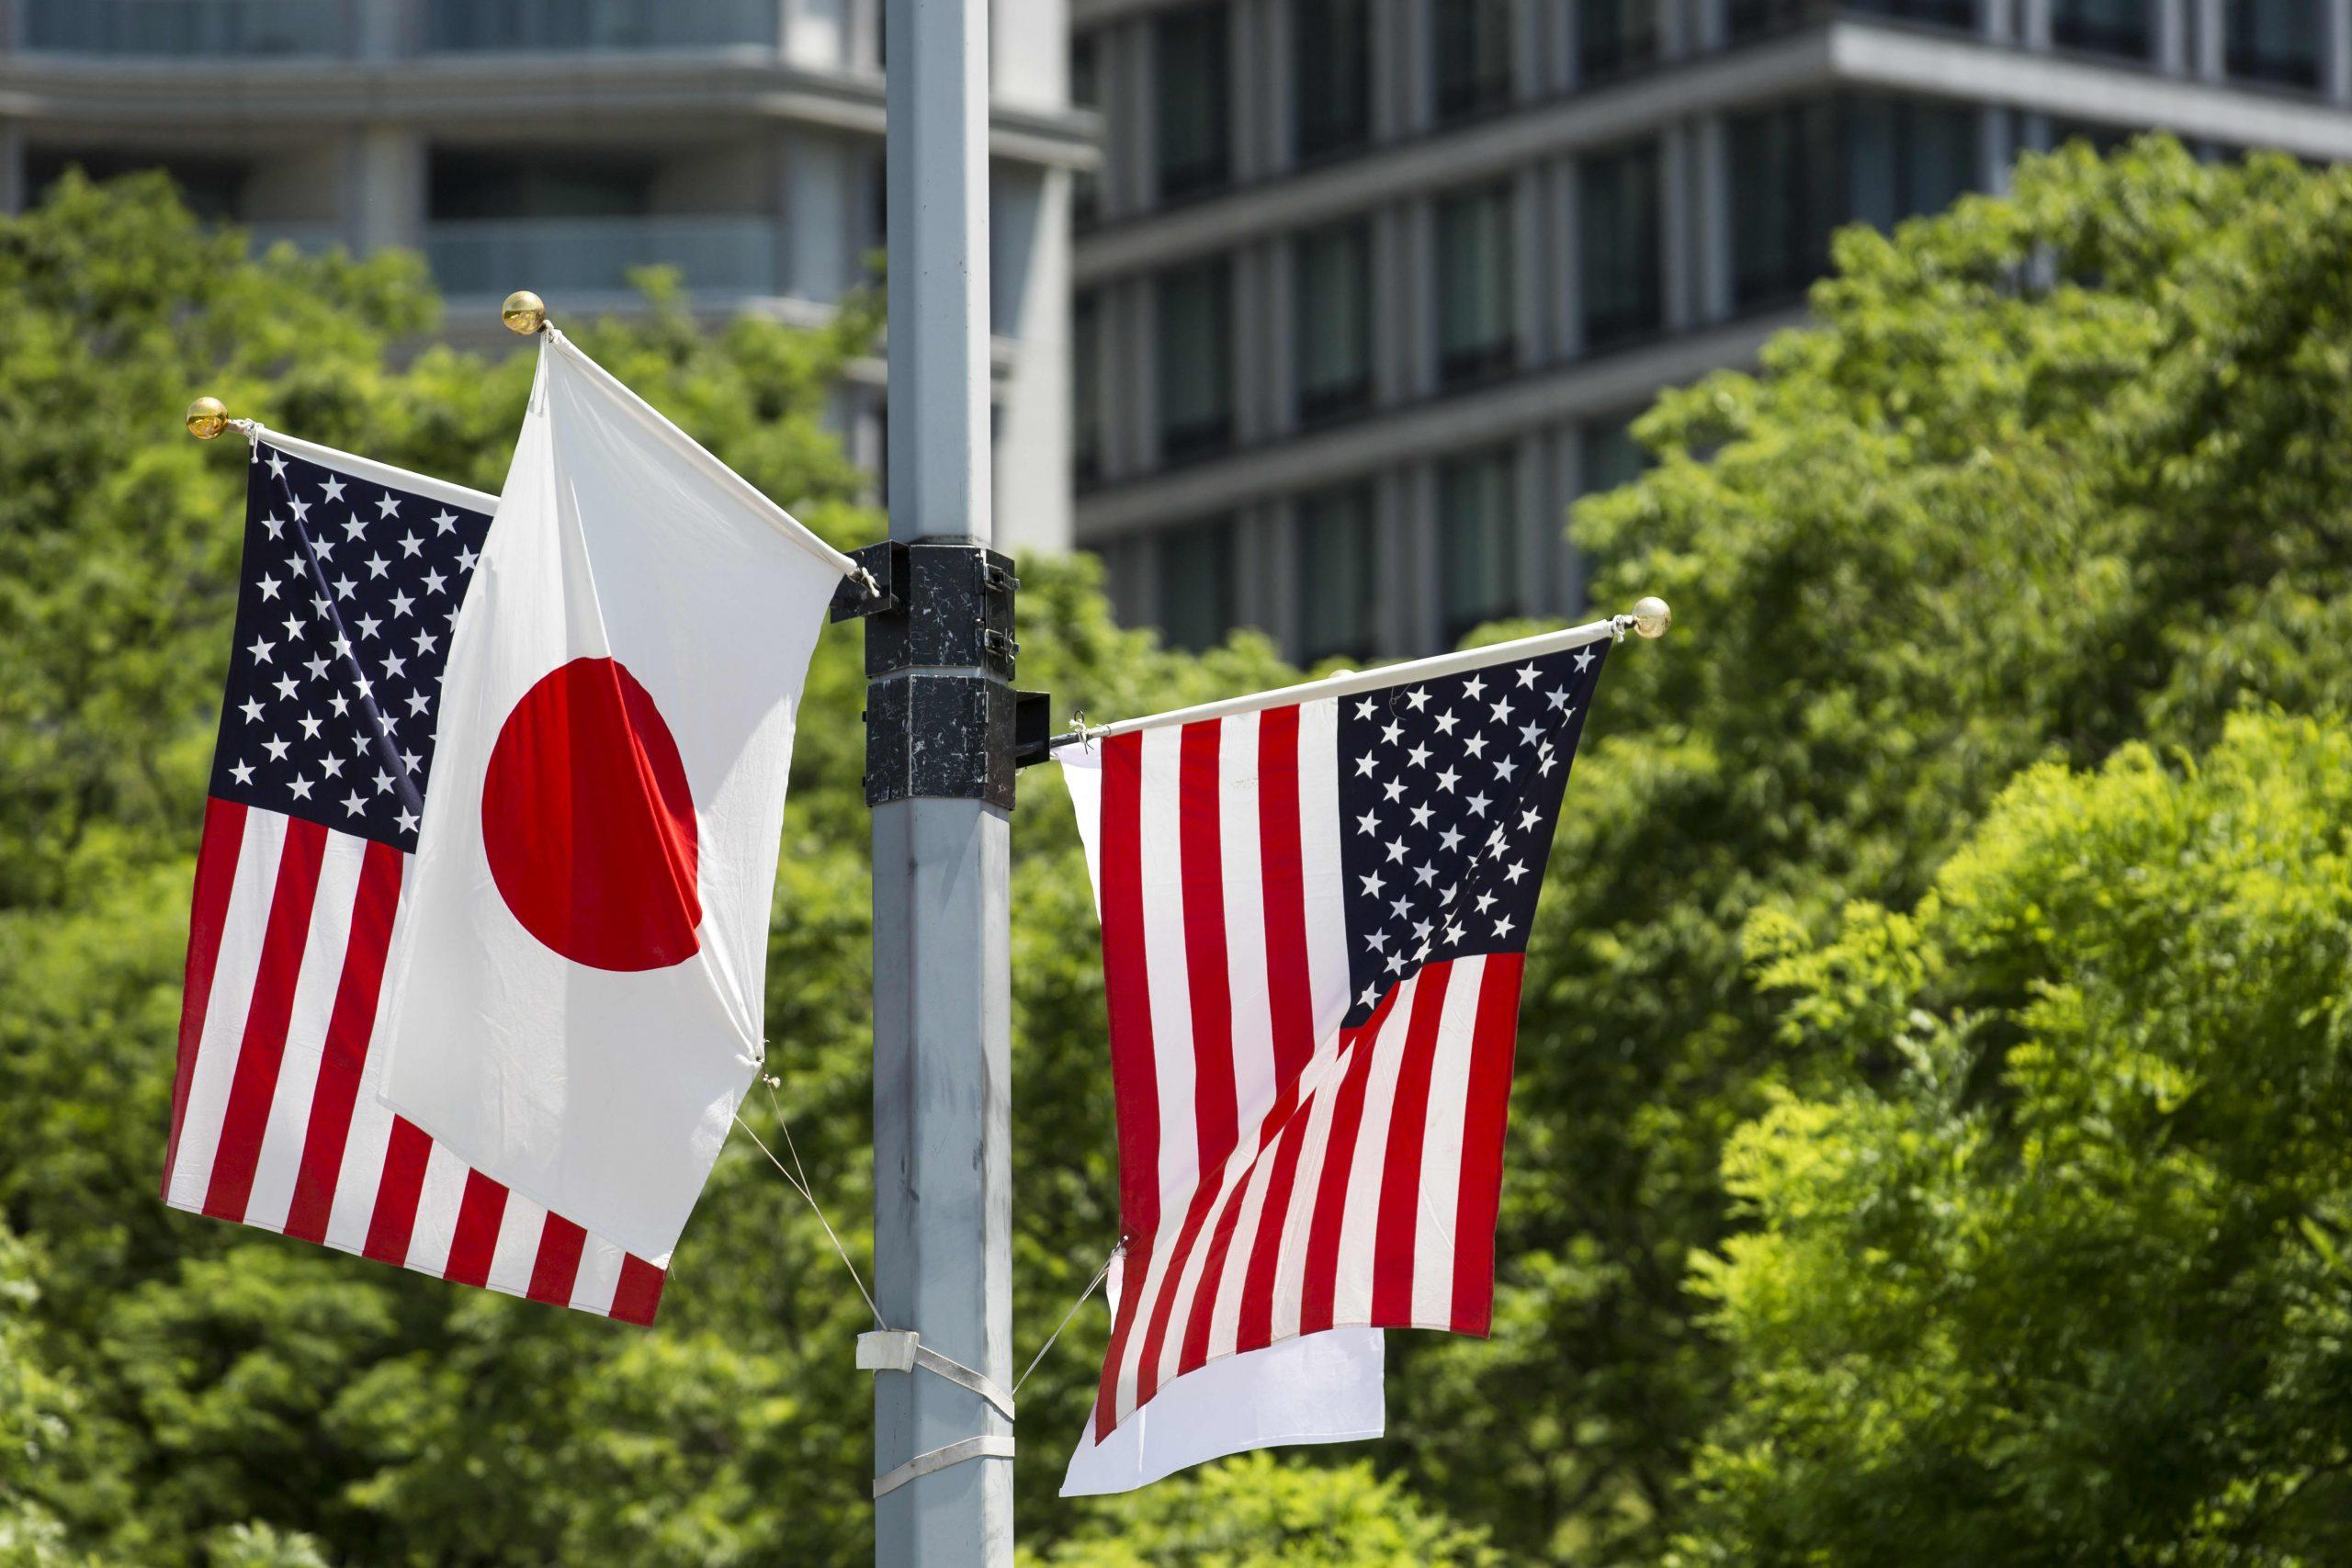 Biden meets Suga as the U.S. prepares to challenge China